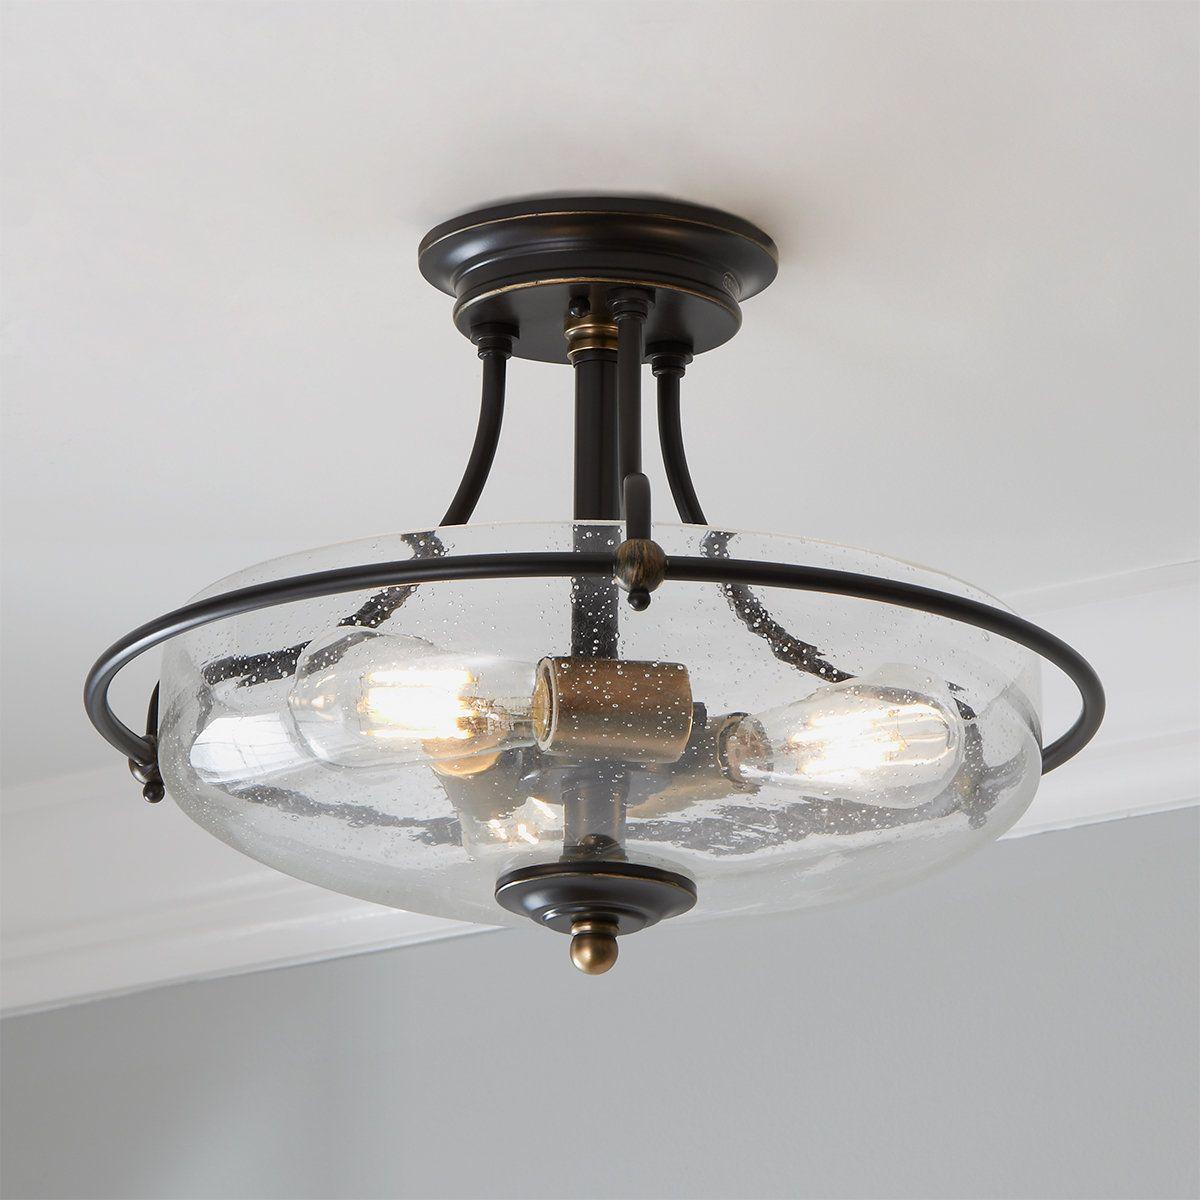 Griffin Semiflush Ceiling Light In 2021 Semi Flush Ceiling Lights Ceiling Lights Farmhouse Ceiling Light